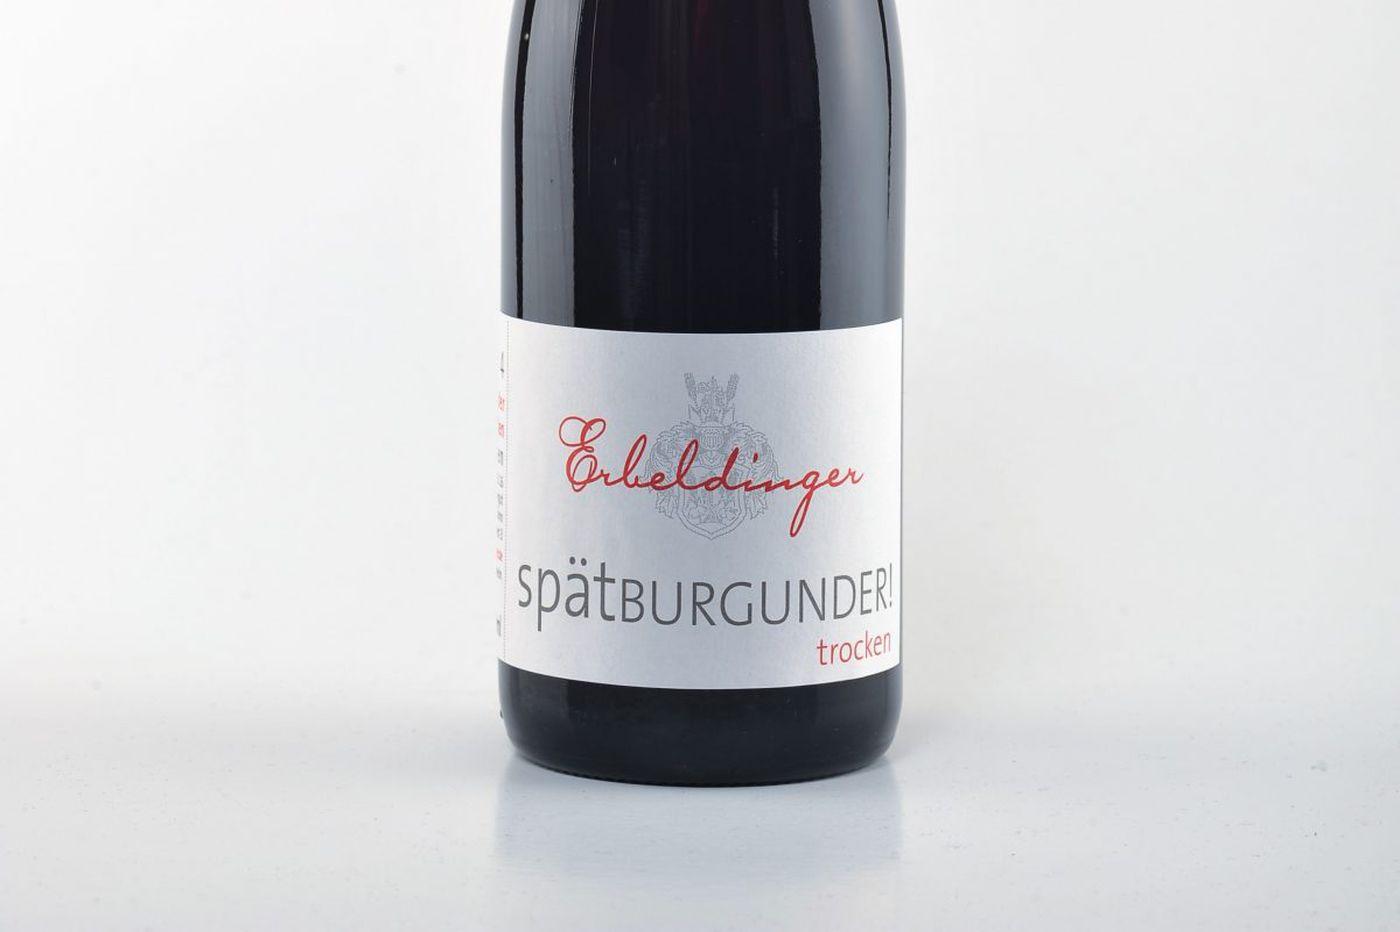 Looking beyond Riesling to Spätburgunder, Germany's take on pinot noir